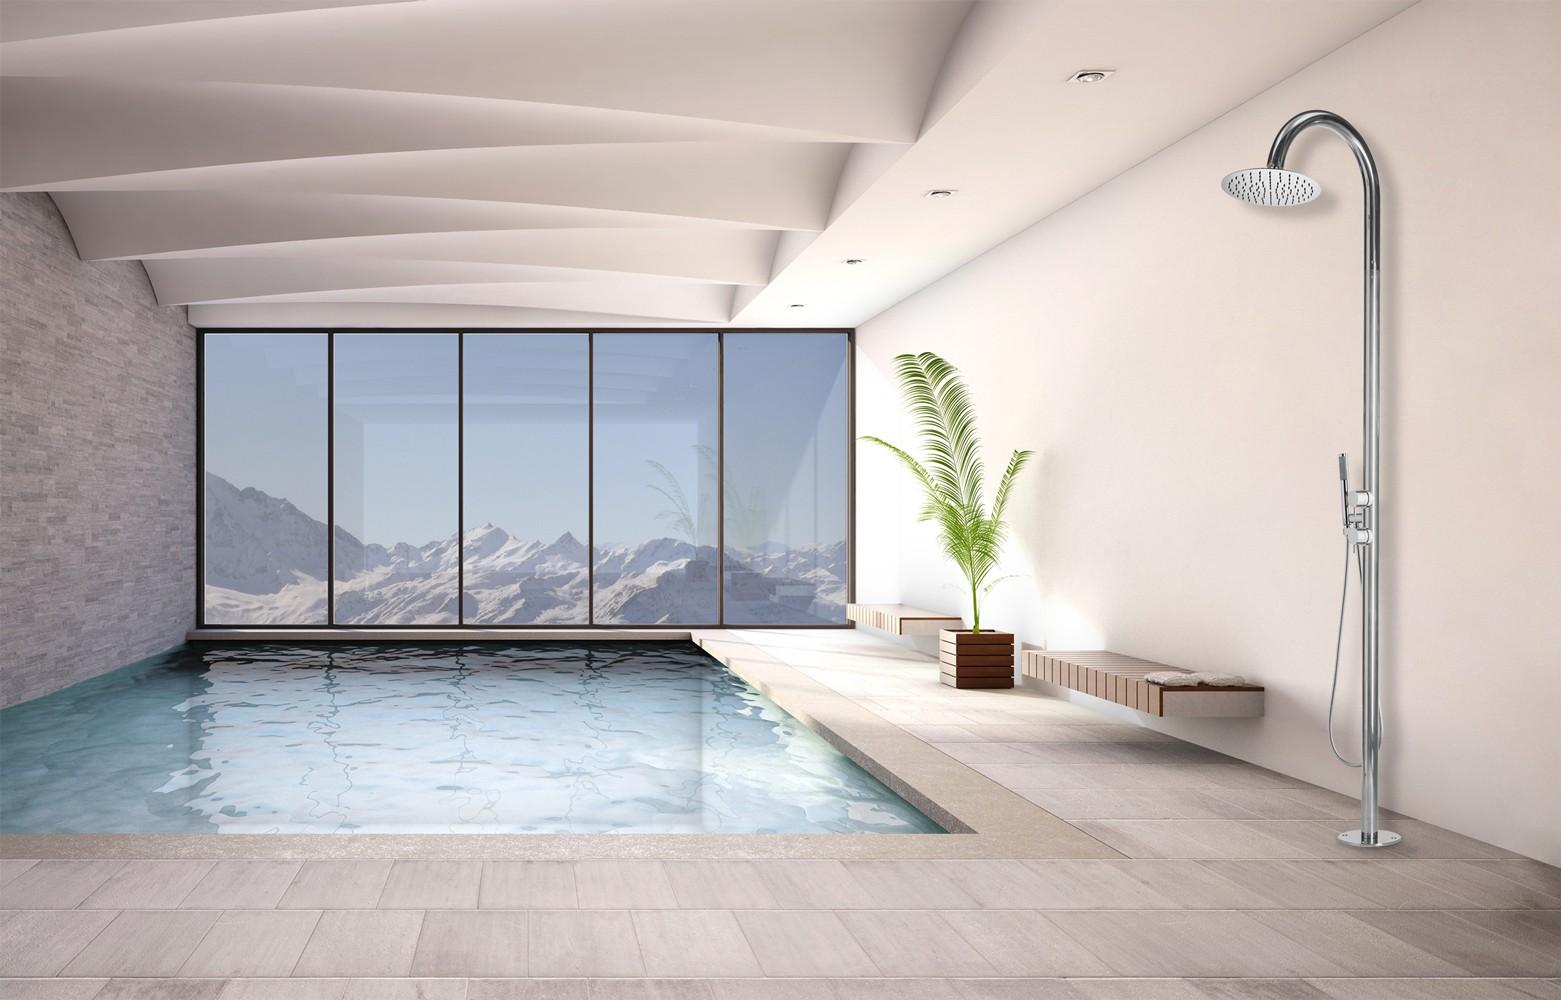 Bossini Twiggy Floor - Rubinetto calda & fredda L00844